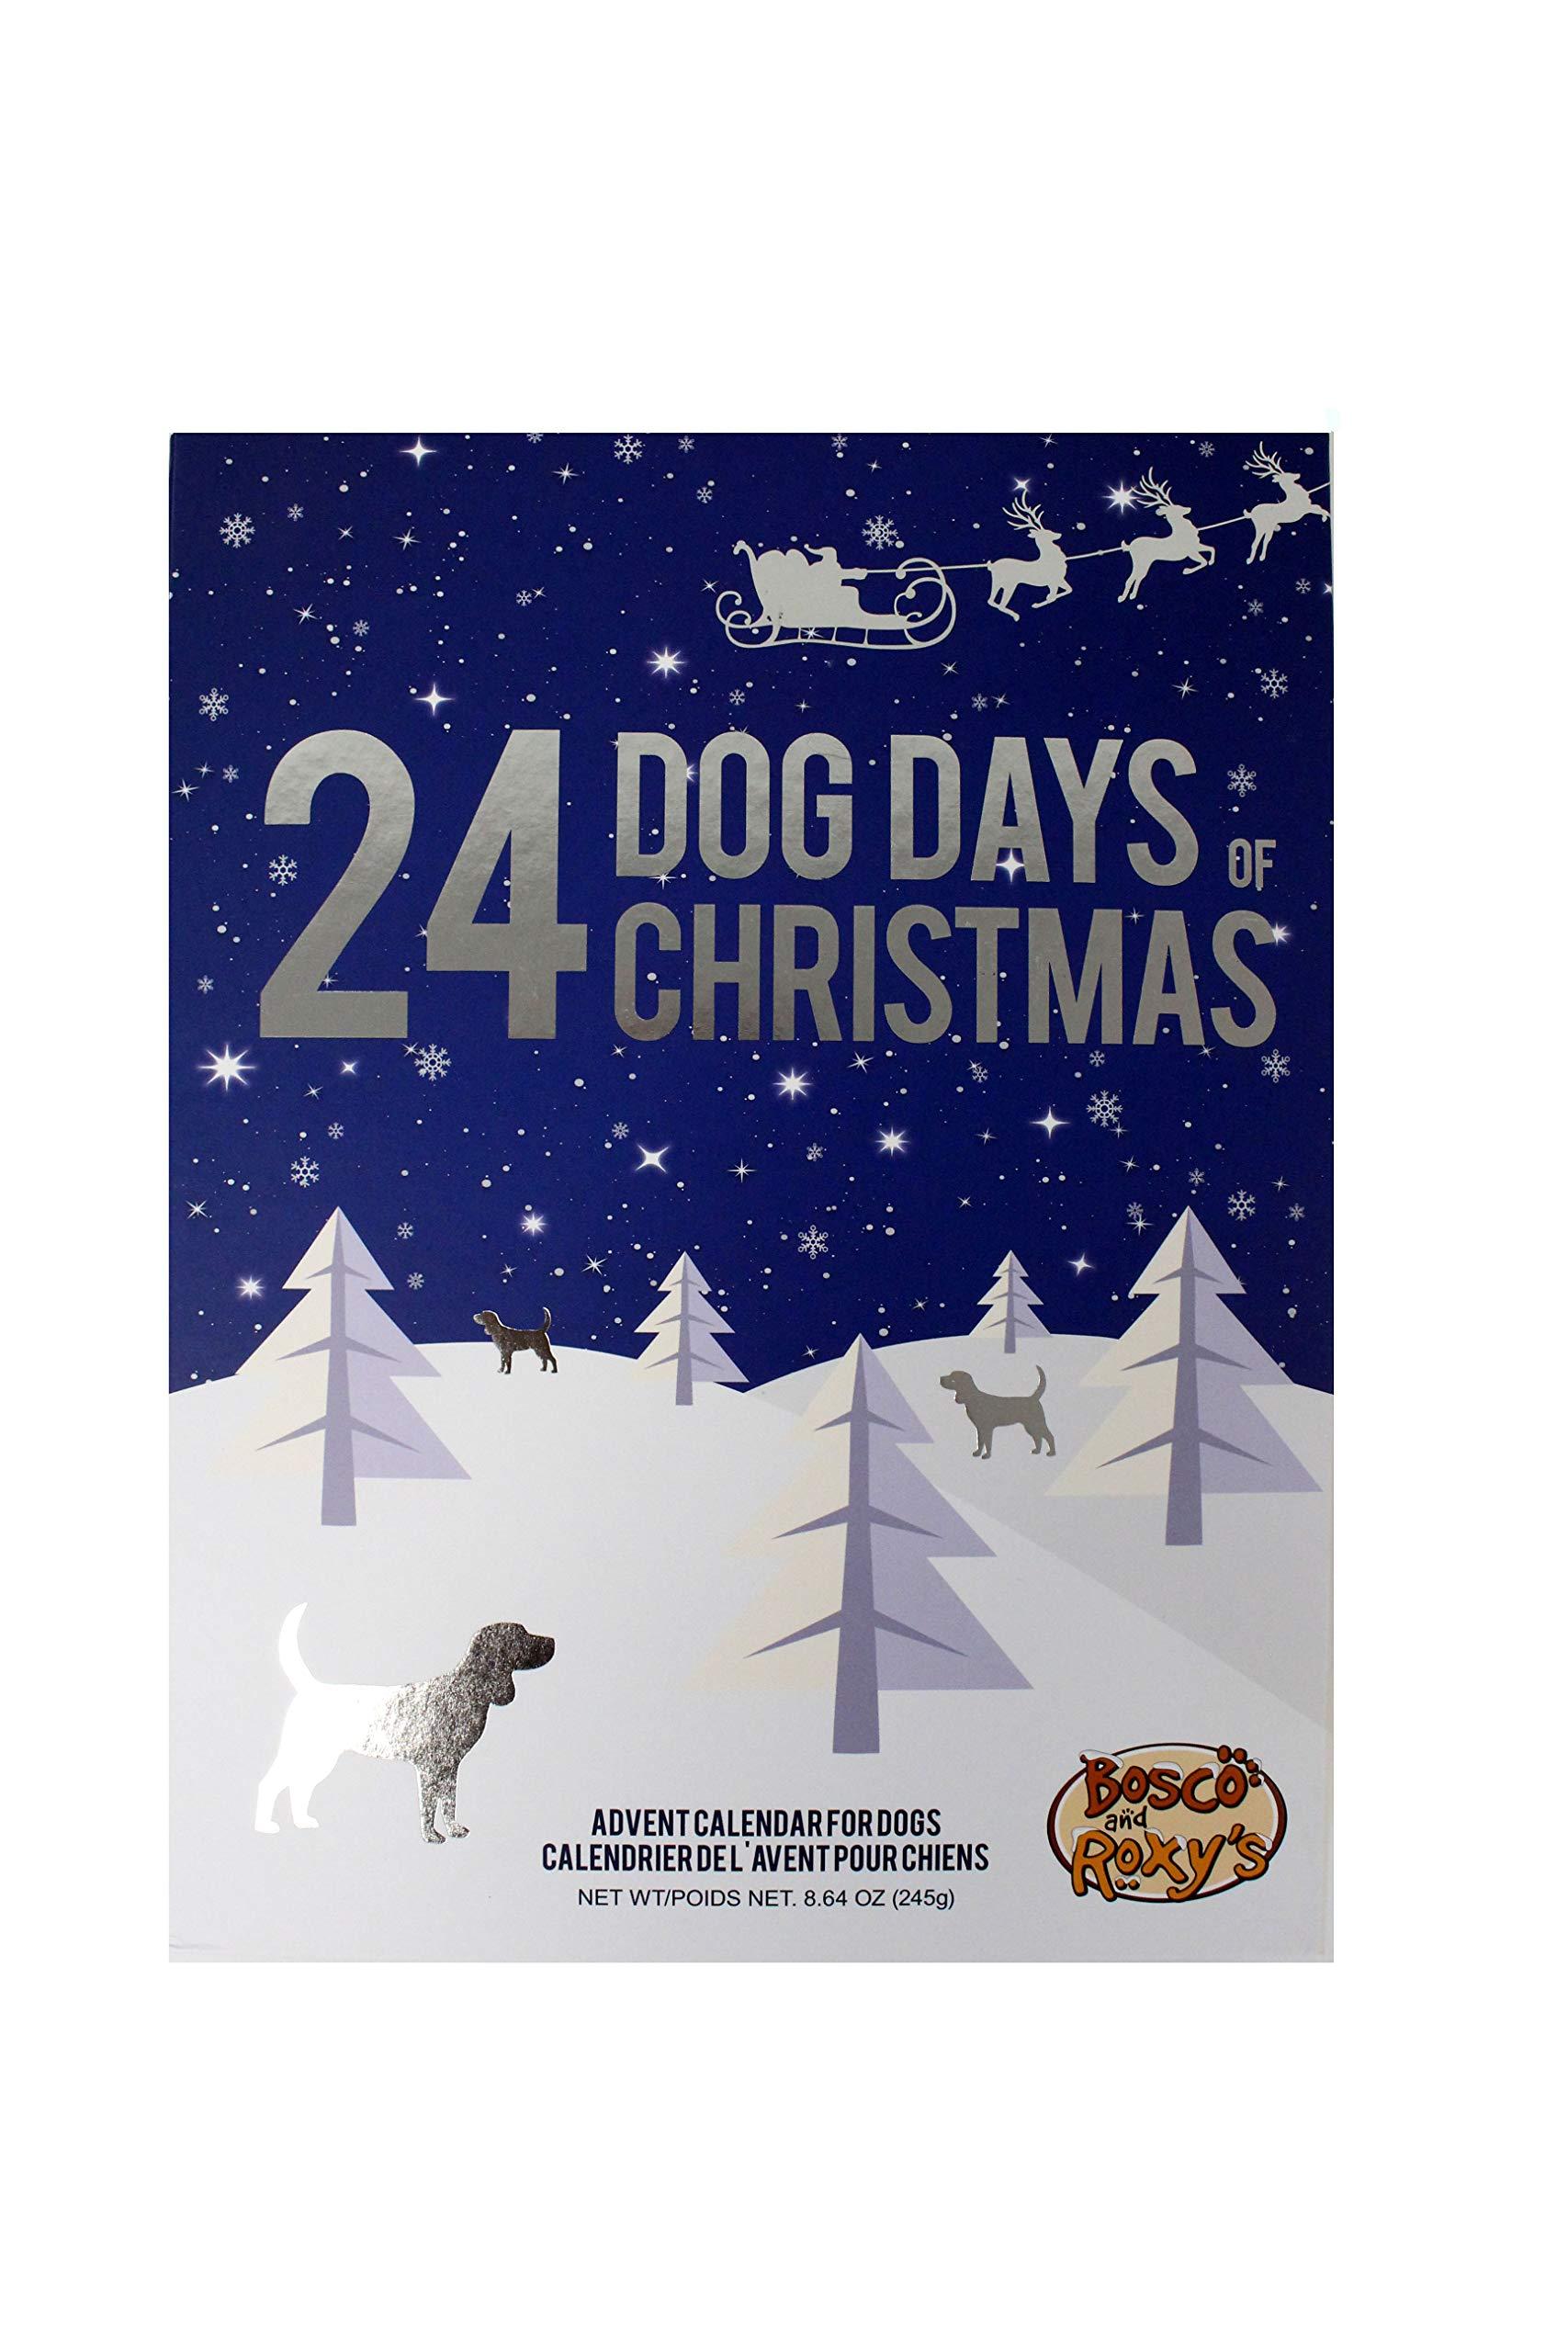 Bosco & Roxy's 24 Dog Days Christmas Advent Treat Calendar Image